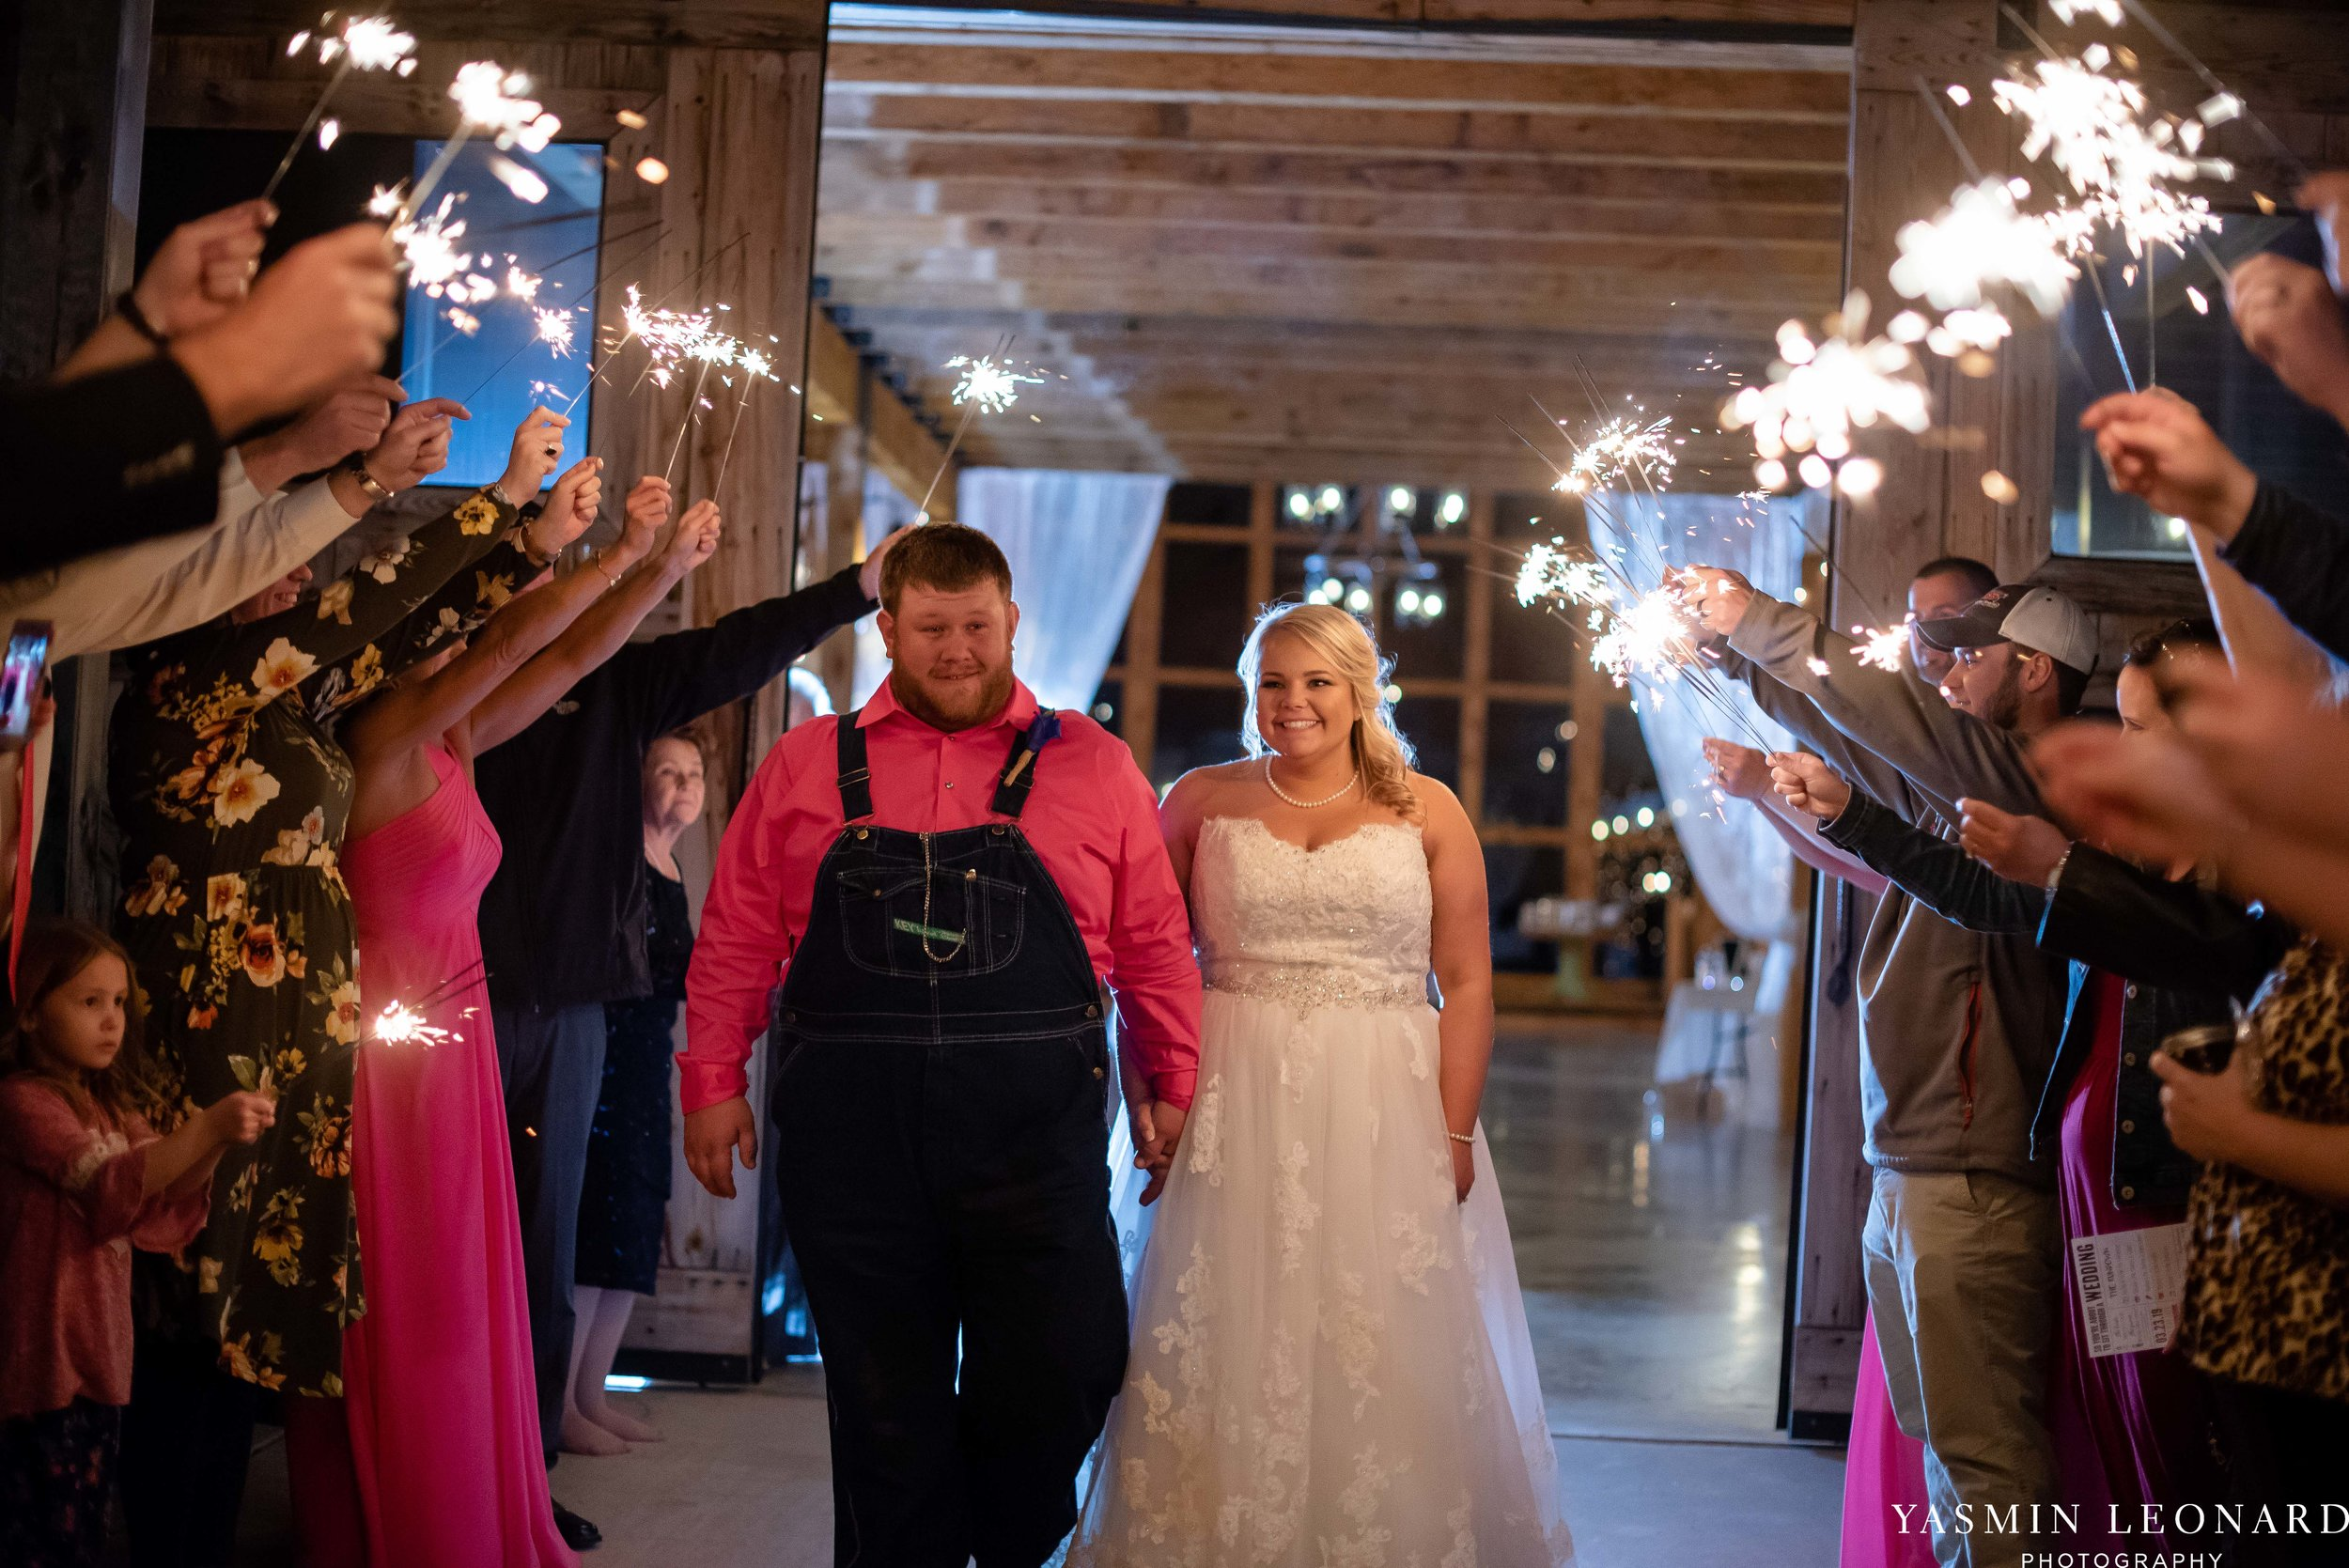 The Barn at Heritage Farm - Country Wedding - Pink and Blue Wedding - Barn Wedding - Outdoor Wedding - Cotton and Wheat Decor - Groom in Bibs - Pink Bridal Colors - Yasmin Leonard Photography-34.jpg